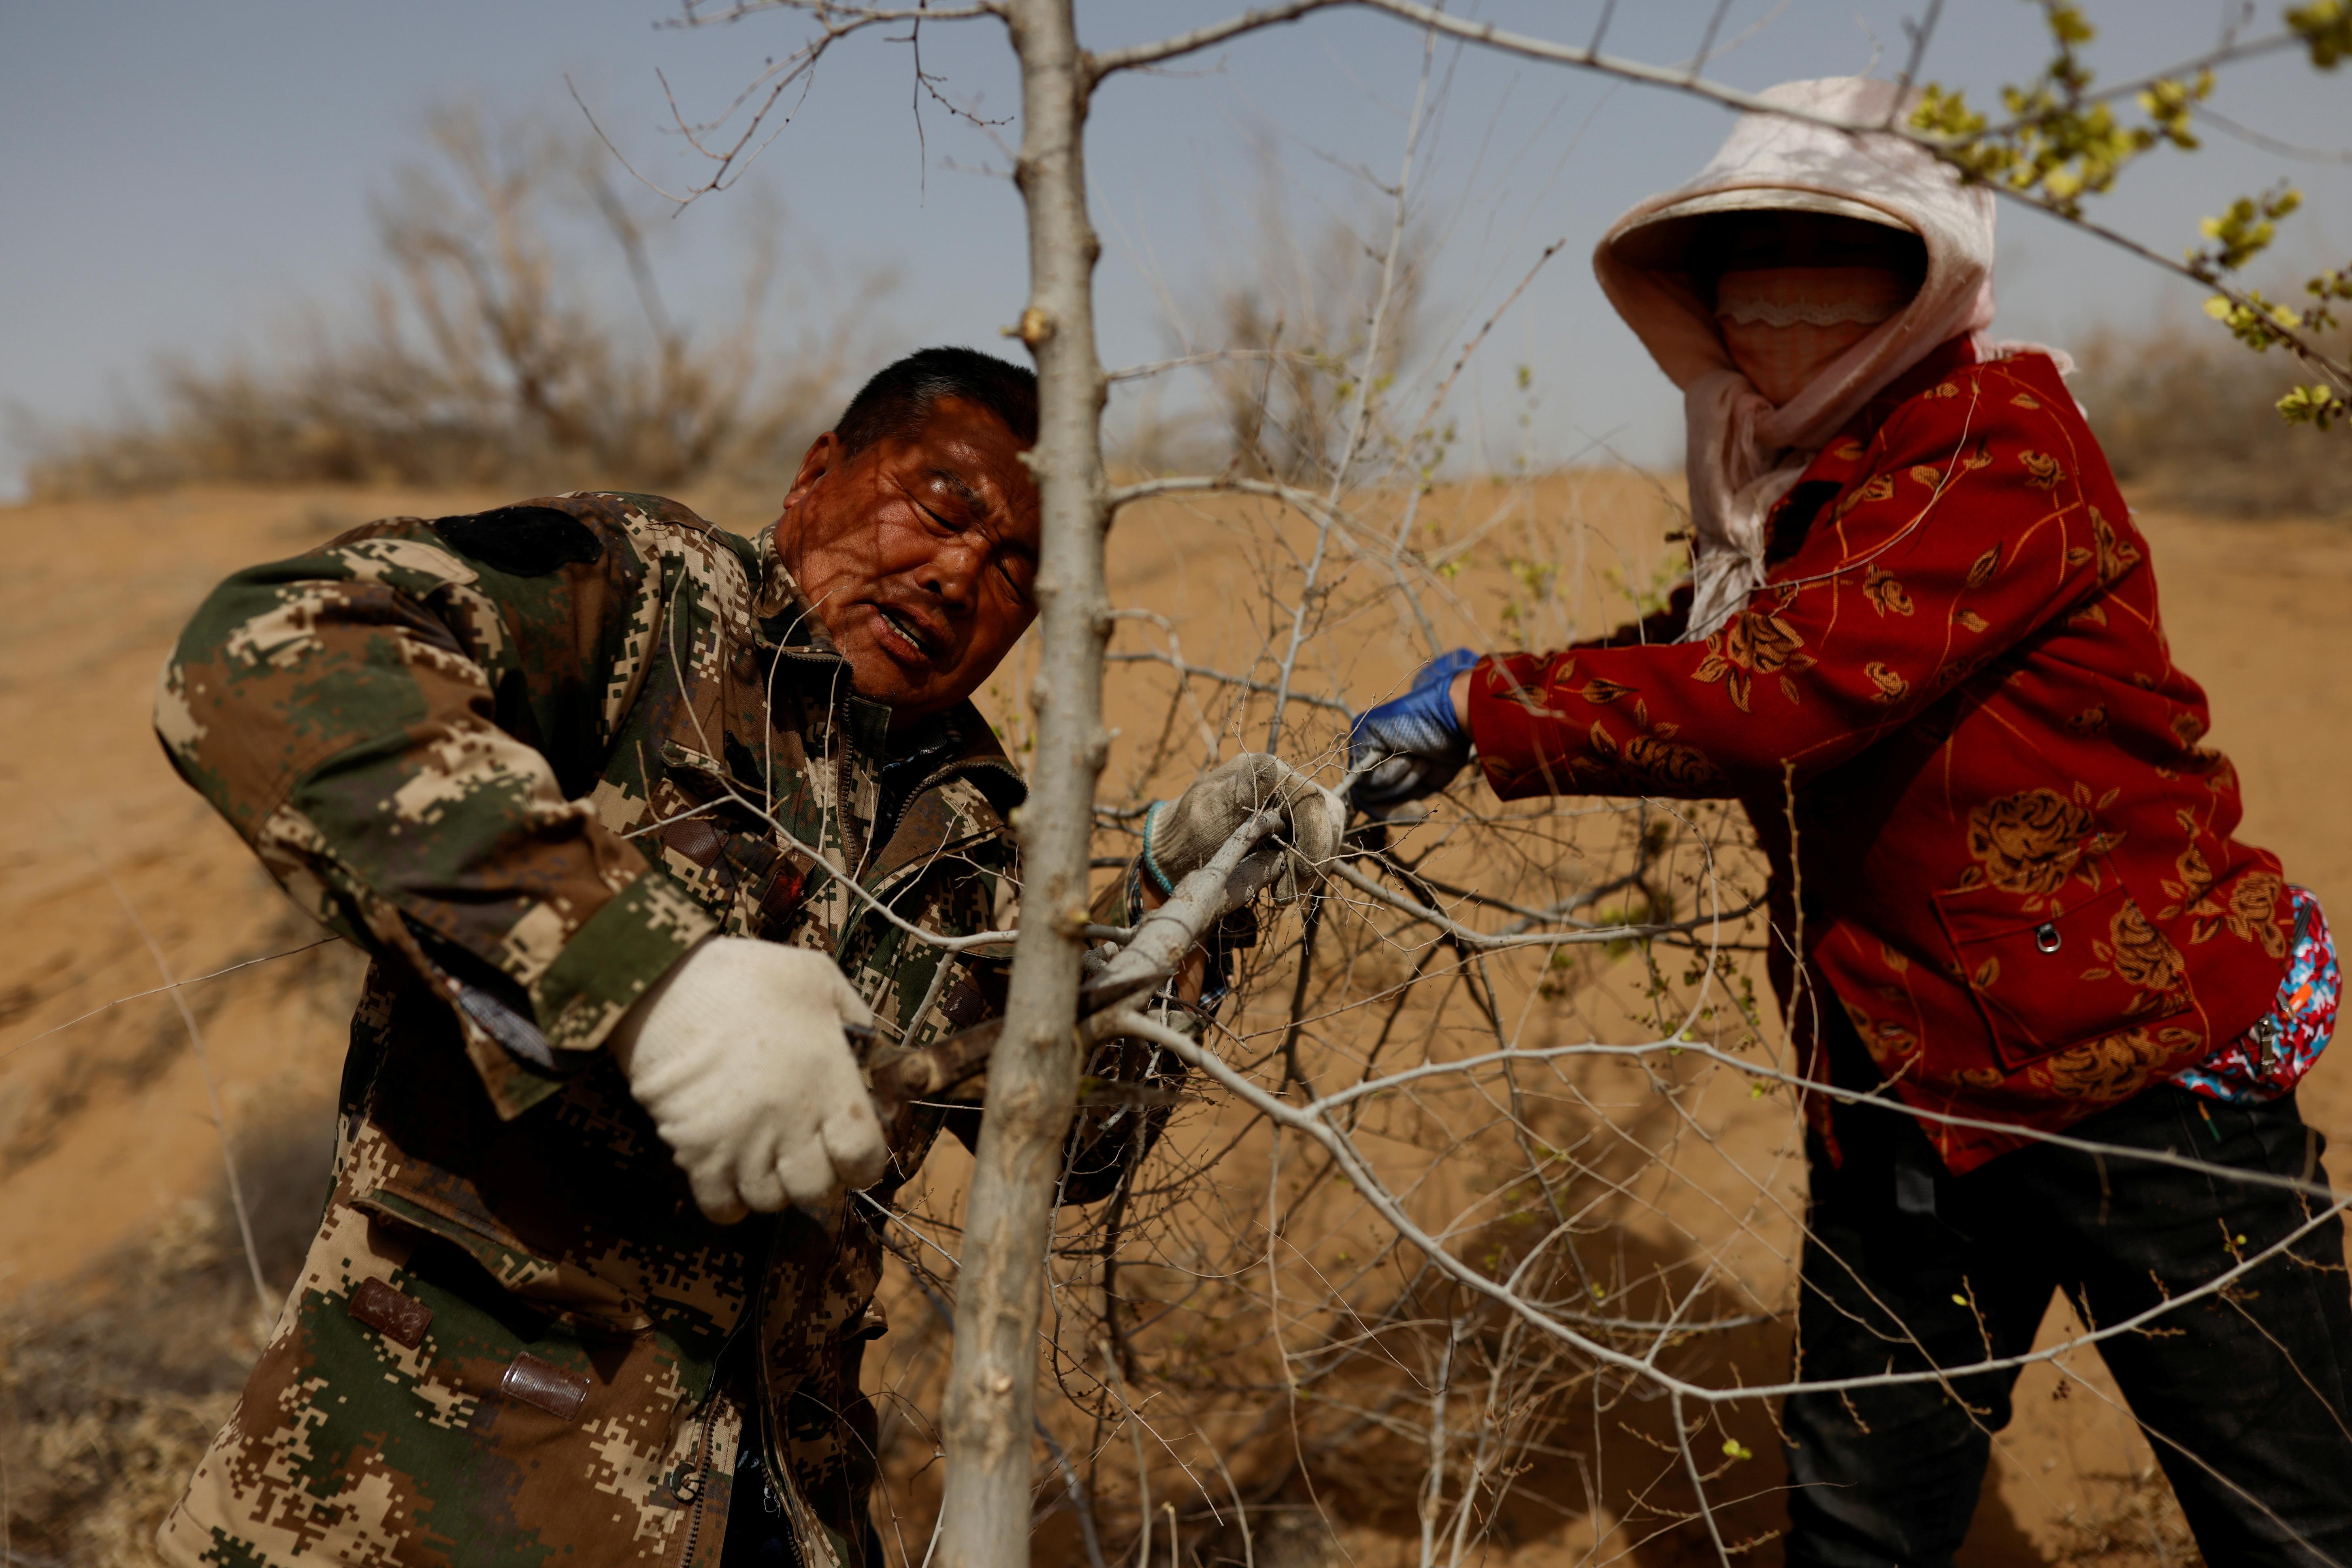 Wang Yinji, 53, and his wife, Jin Yuxiu, trim a tree planted on the edge of the Gobi desert on the outskirts of Wuwei, Gansu province, China, April 15, 2021. REUTERS/Carlos Garcia Rawlins/File Photo